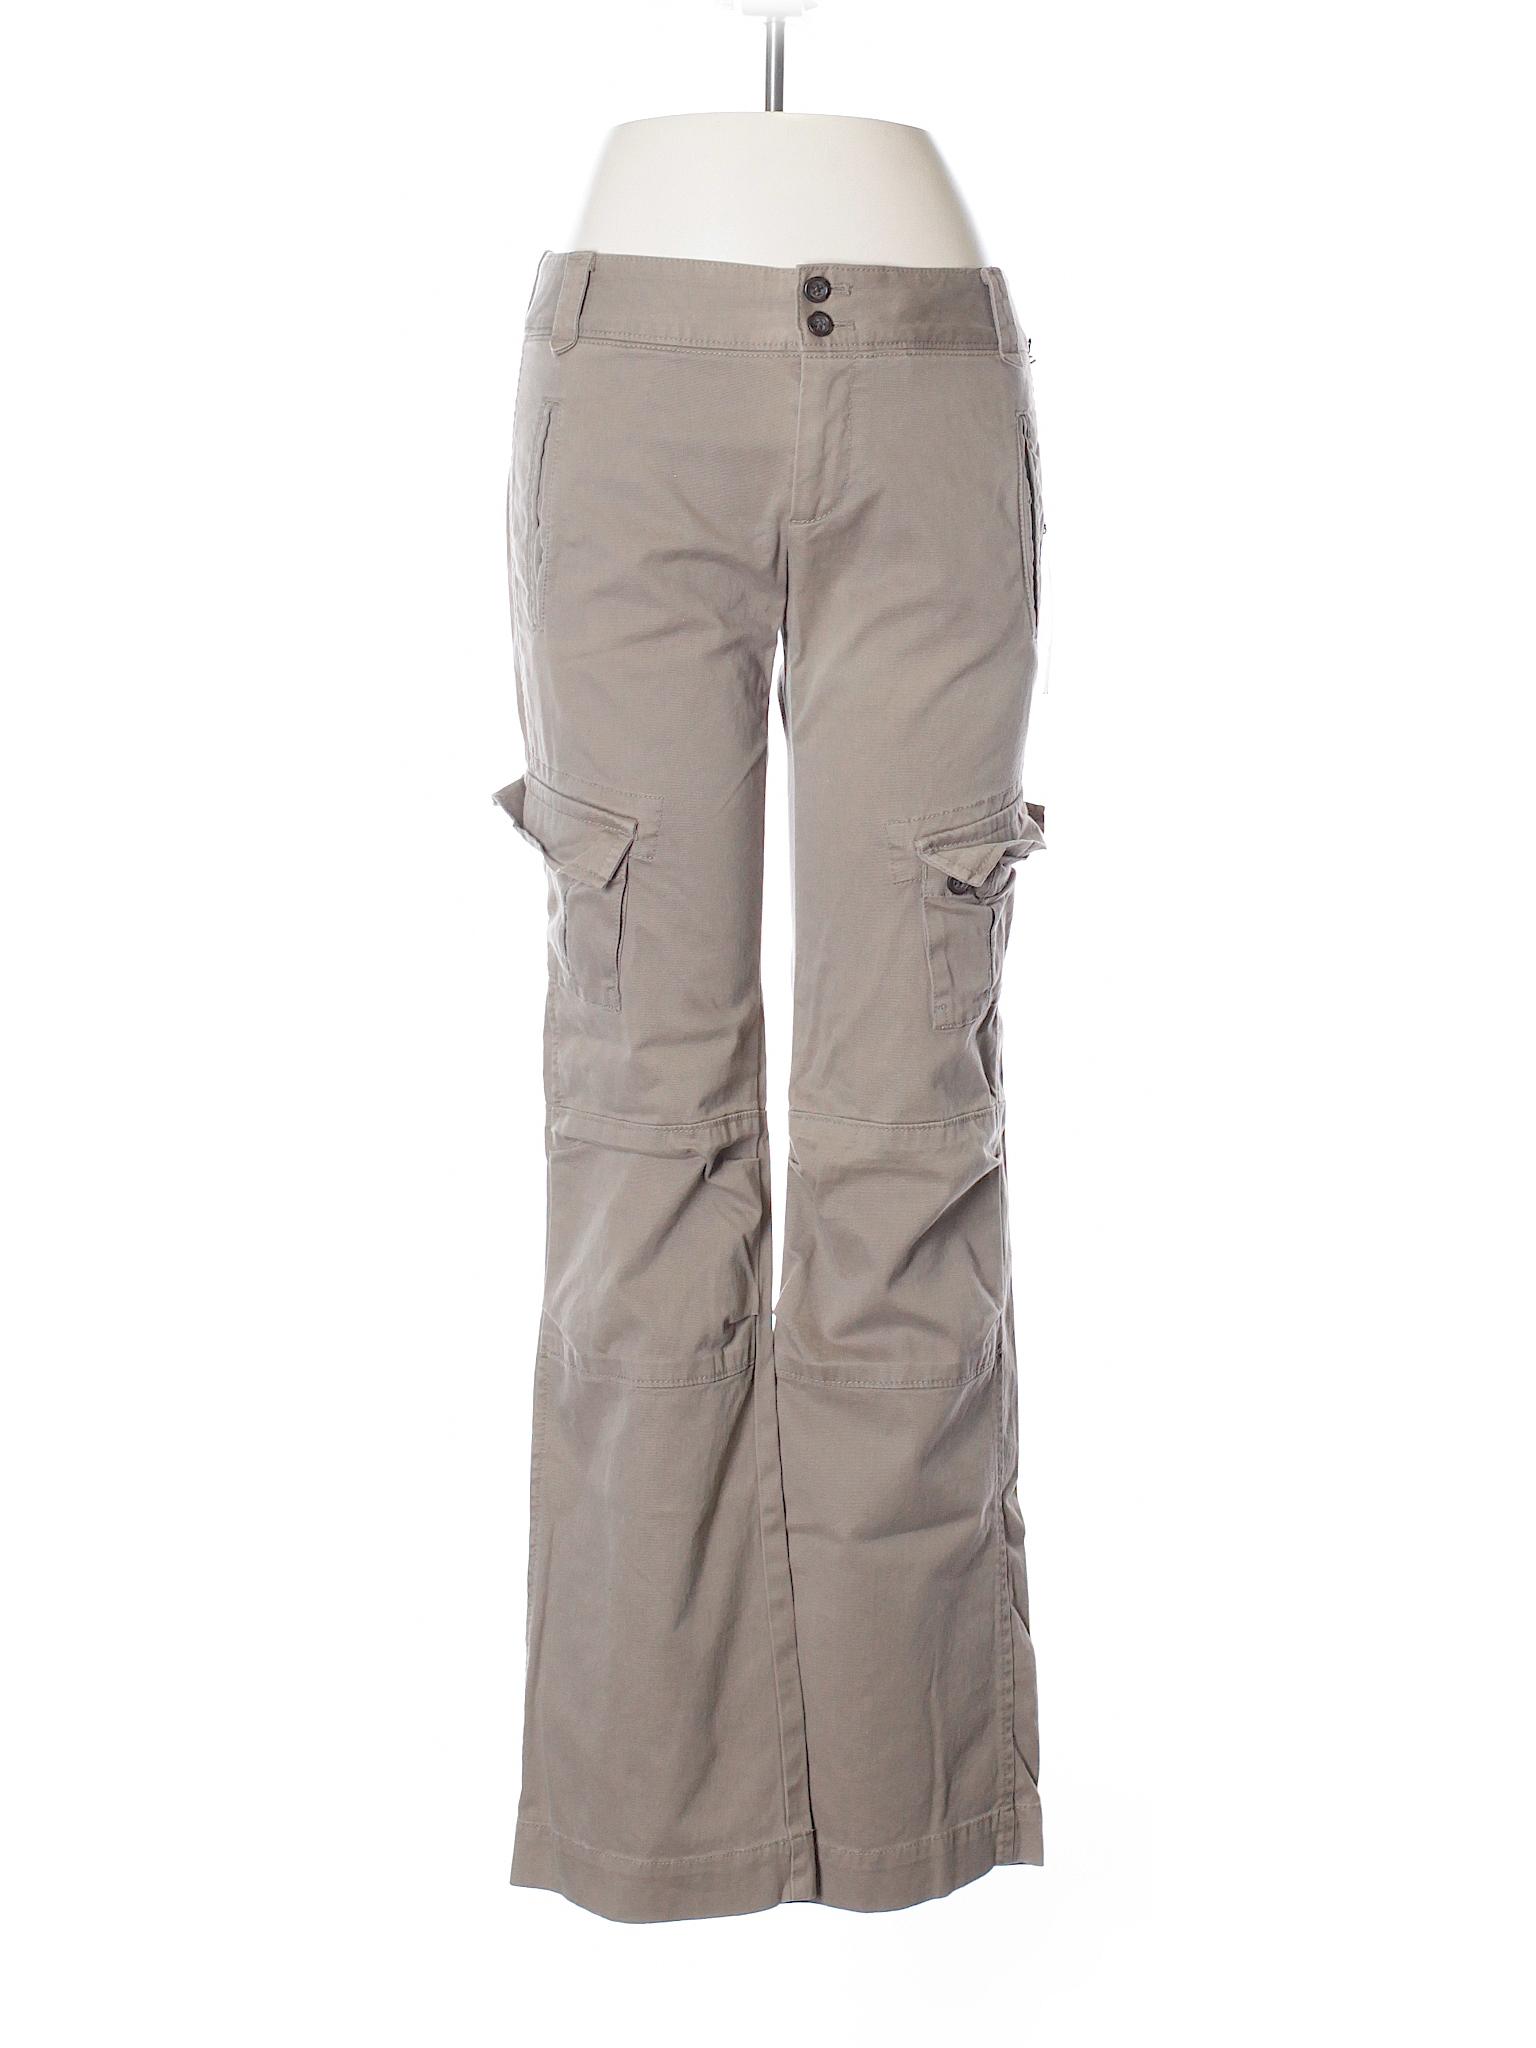 Fantastic Beige Cargo Pants Womens  Simple White Beige Cargo Pants Womens Image U2013 Playzoa.com